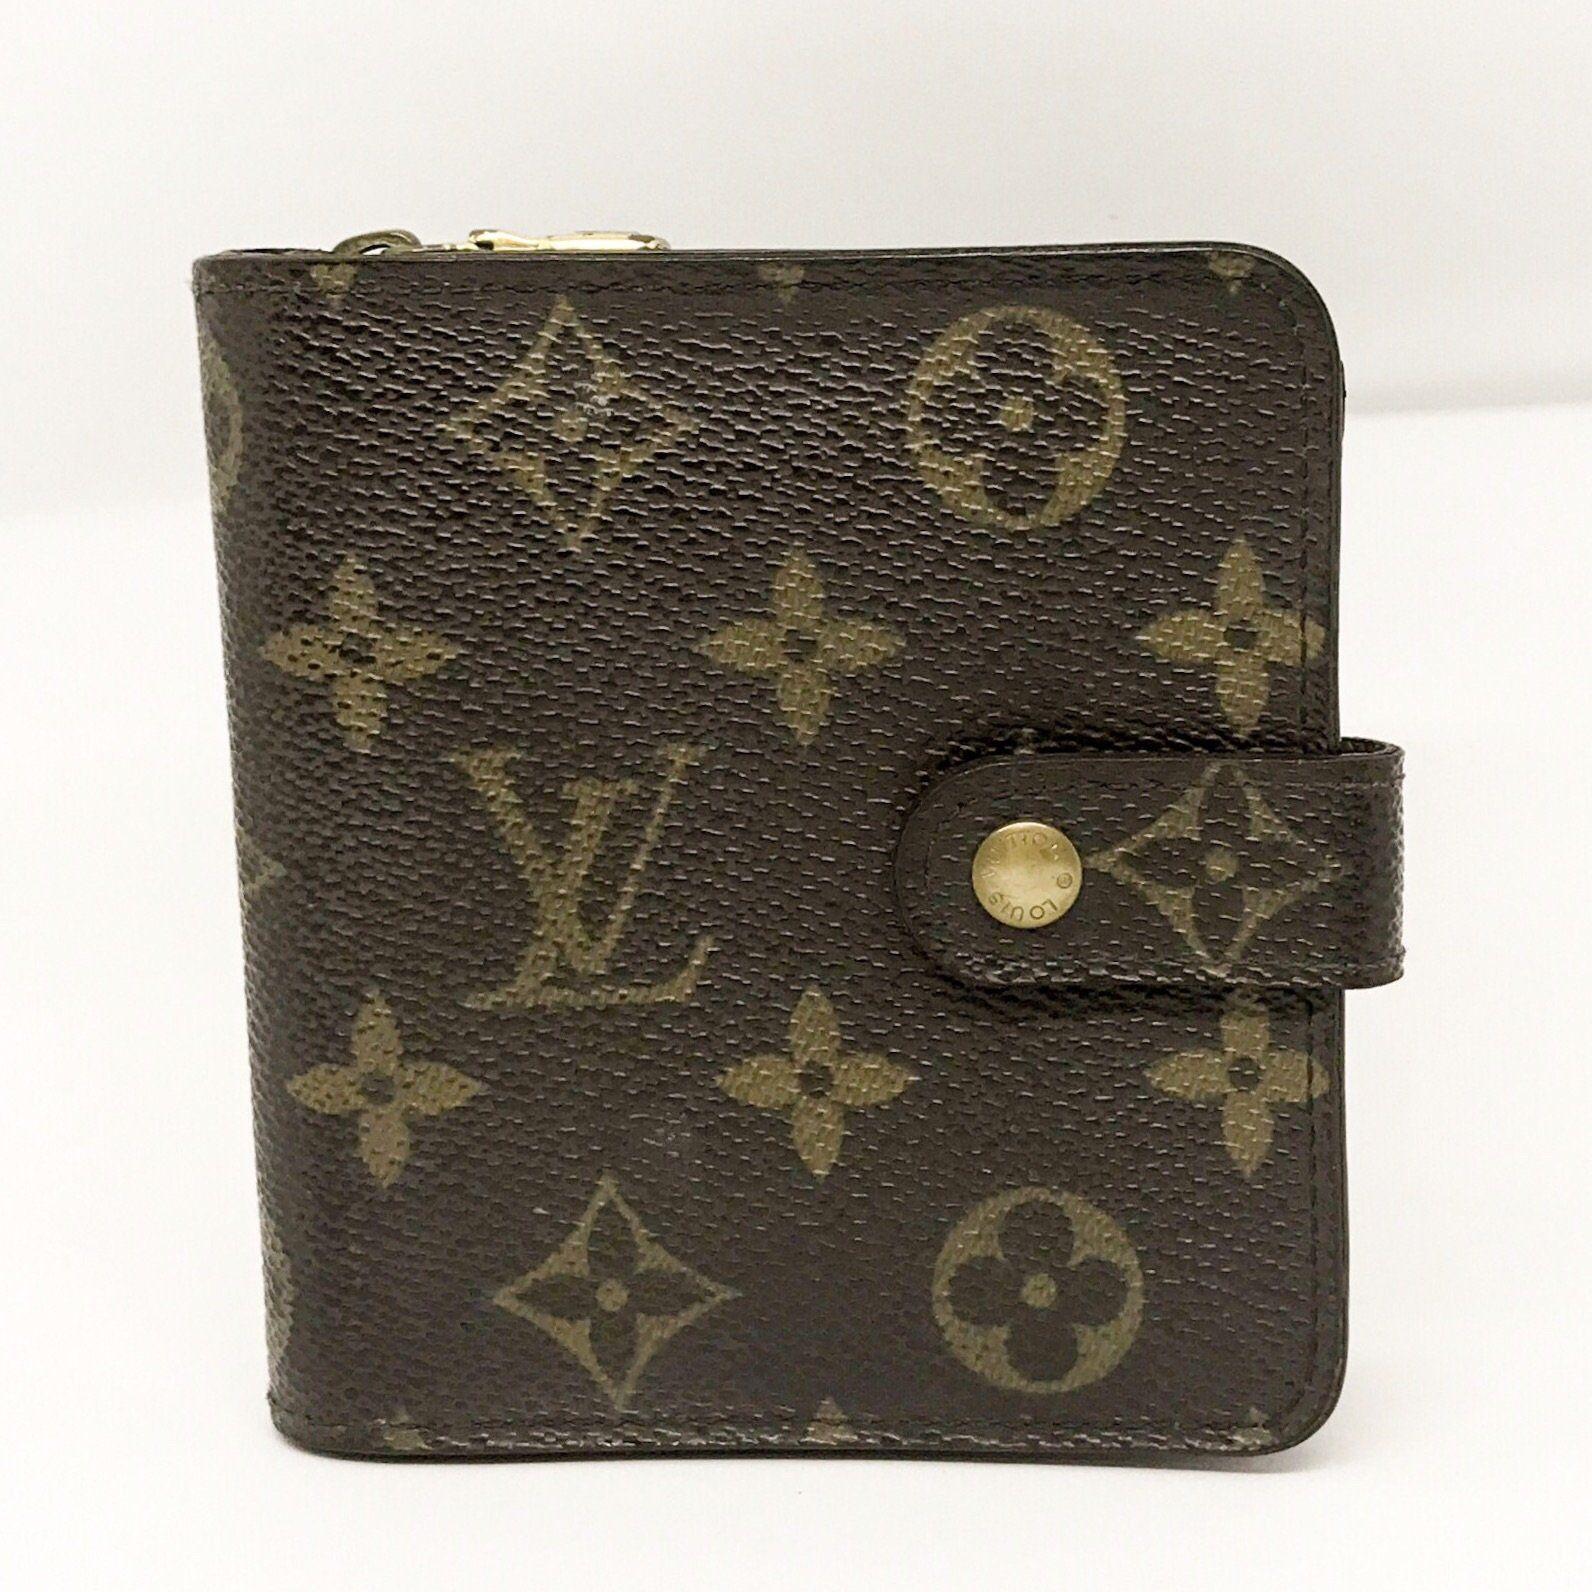 Louis Vuitton Monogram Zippy Bifold Wallet (With images